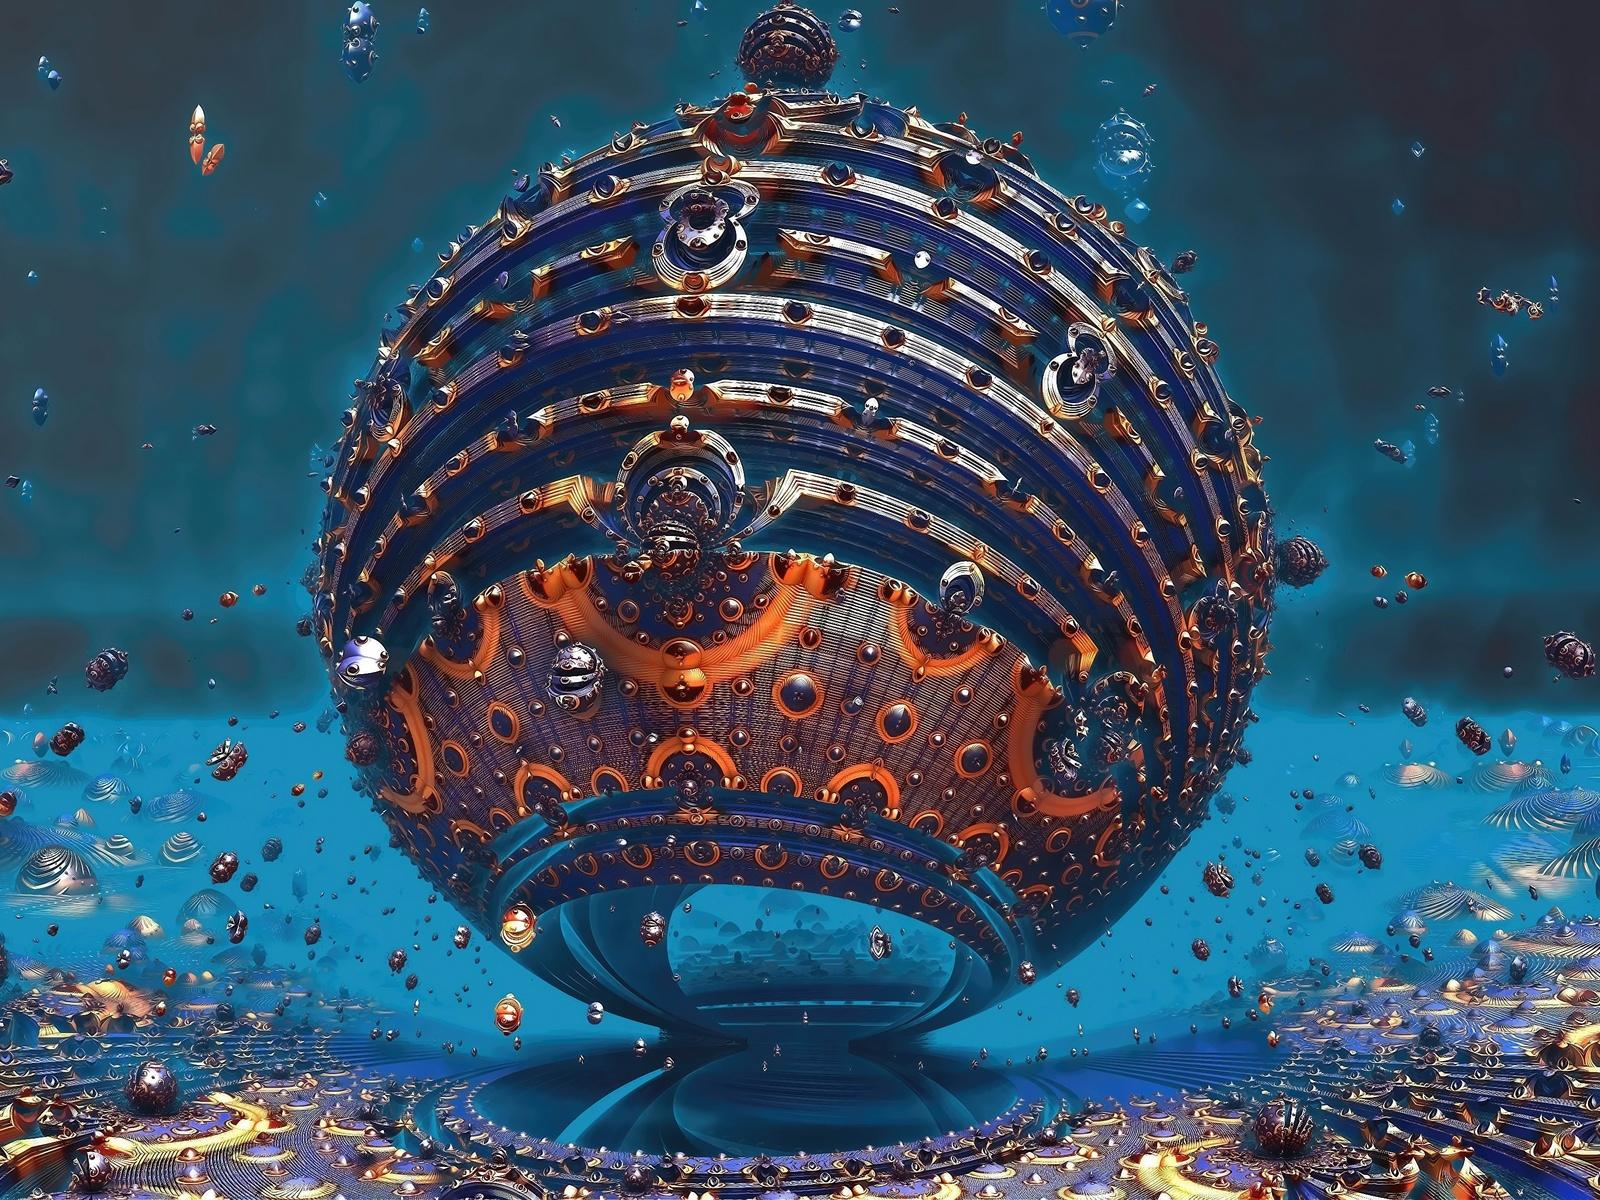 1600x1200 Fractal Sphere 3d 4k 1600x1200 Resolution Hd 4k